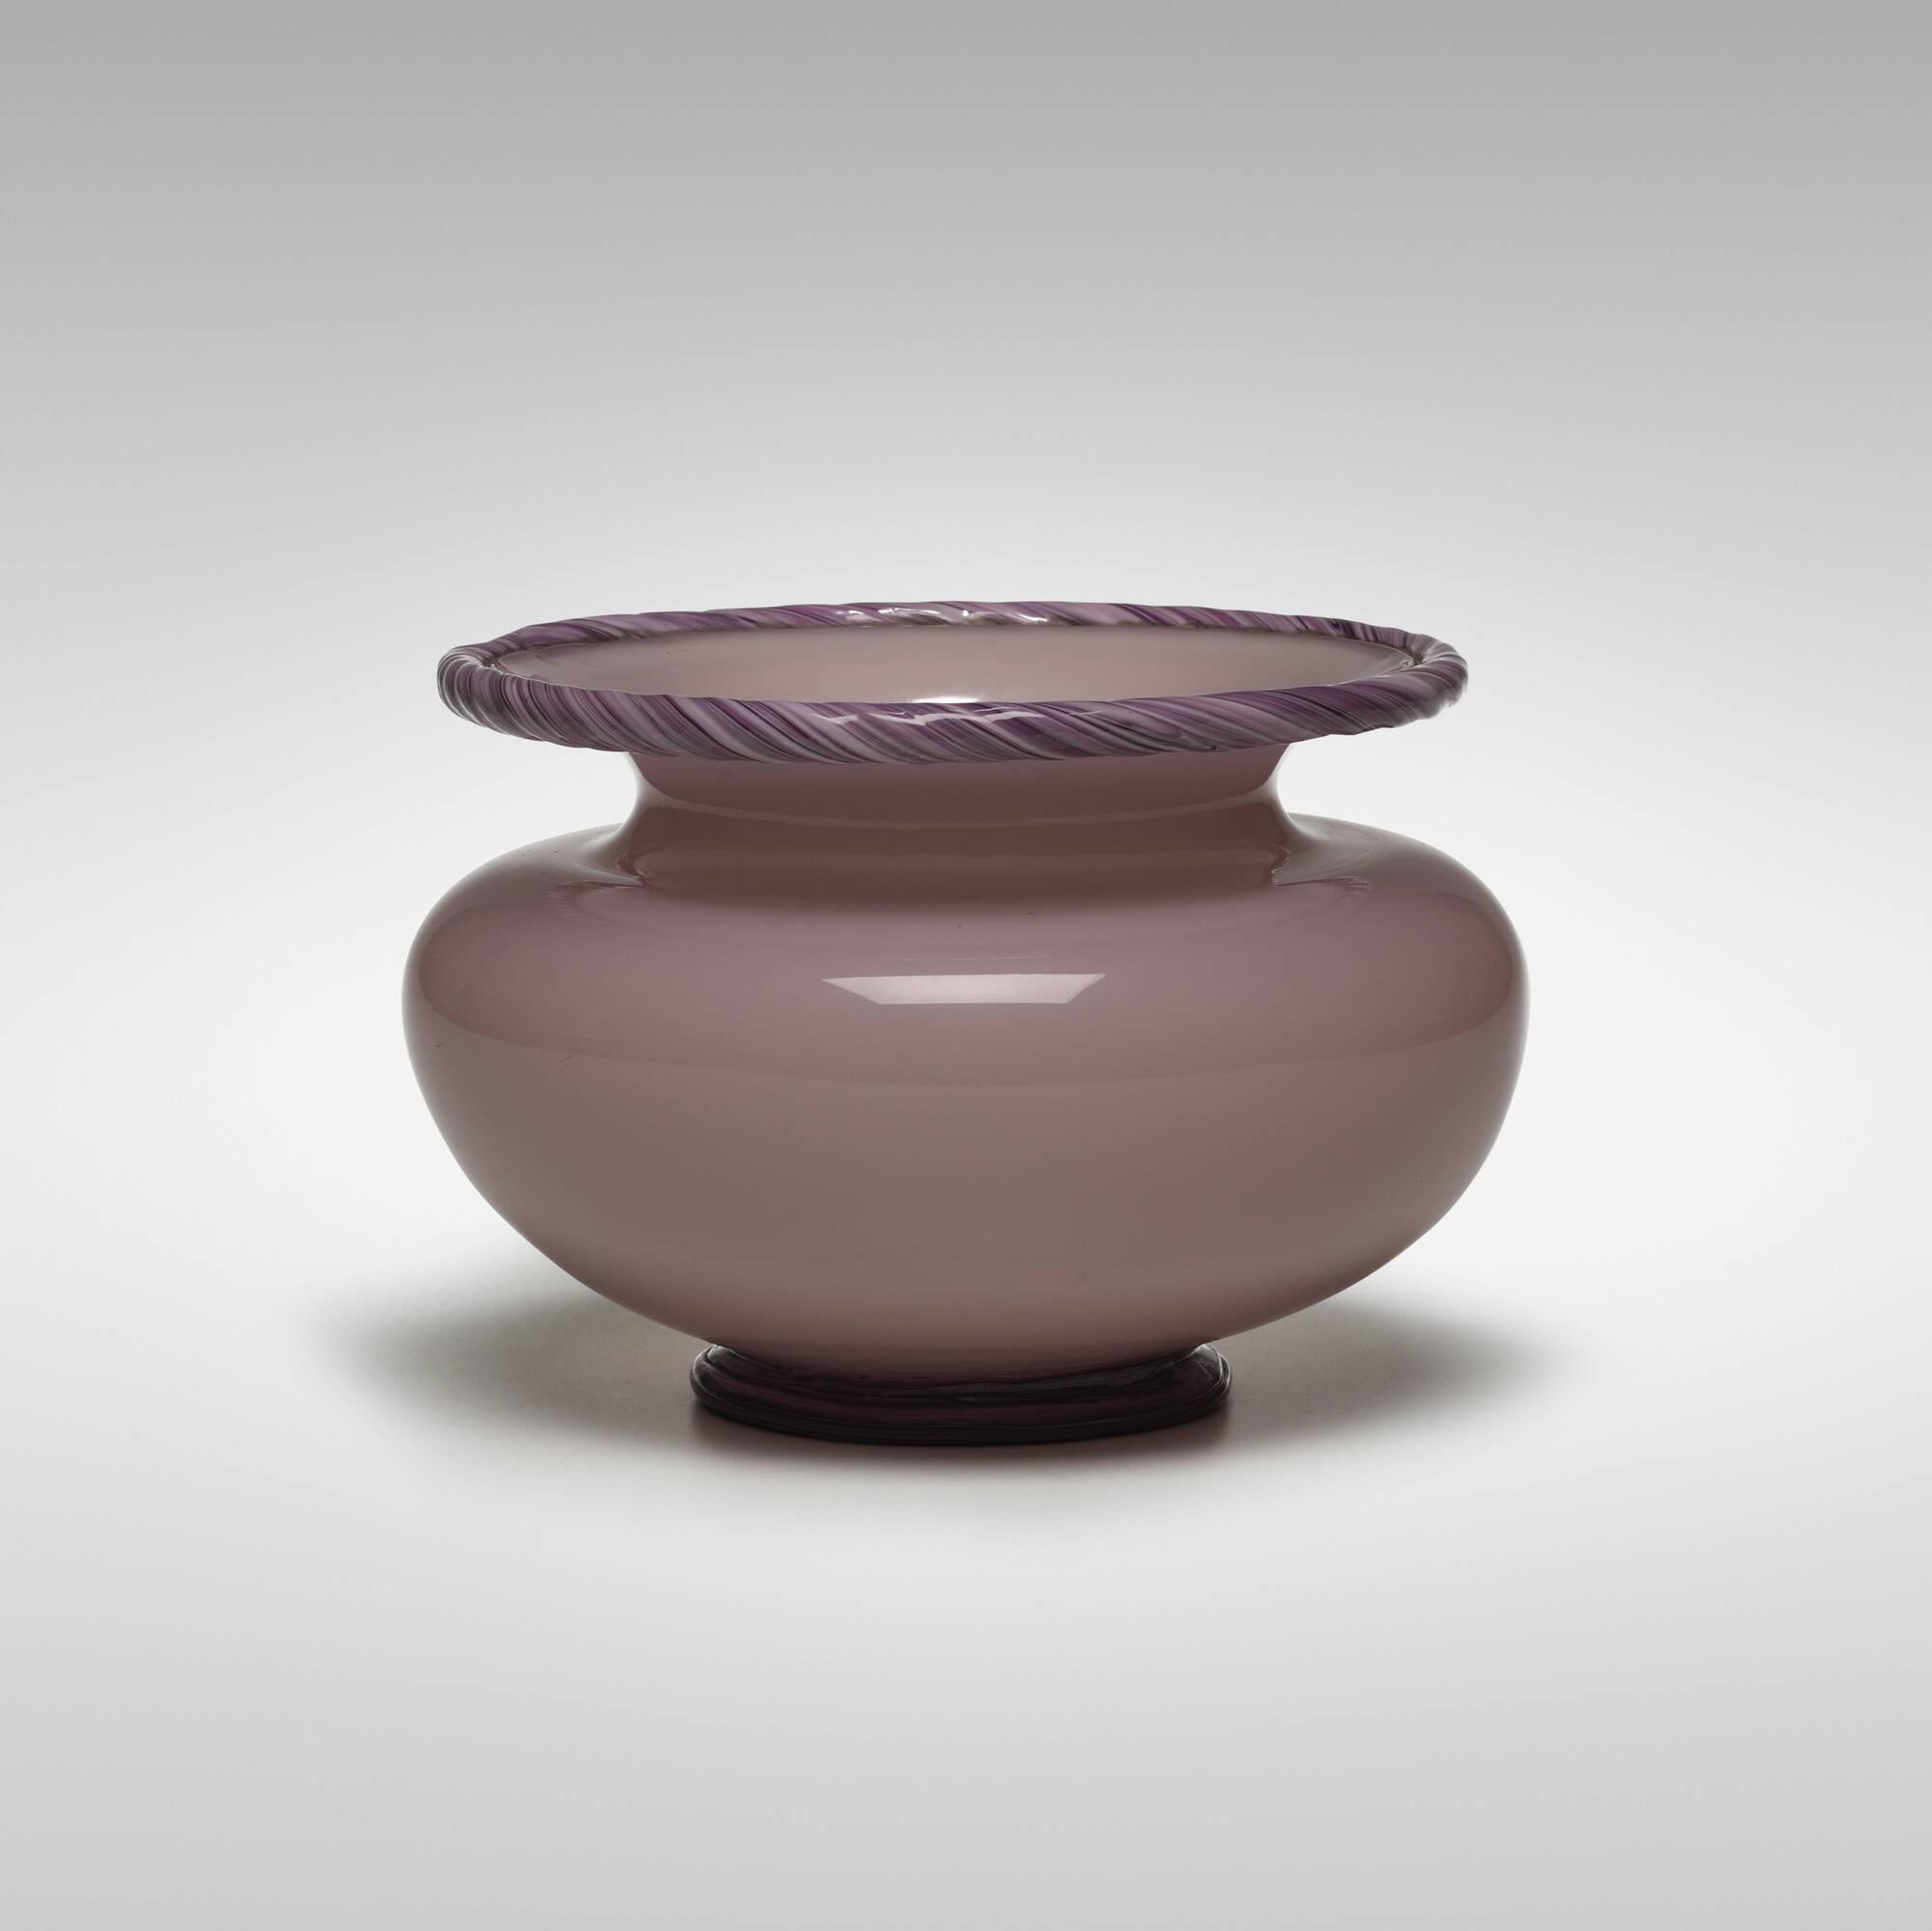 116: Napoleone Martinuzzi / vase, model 3223 (2 of 3)